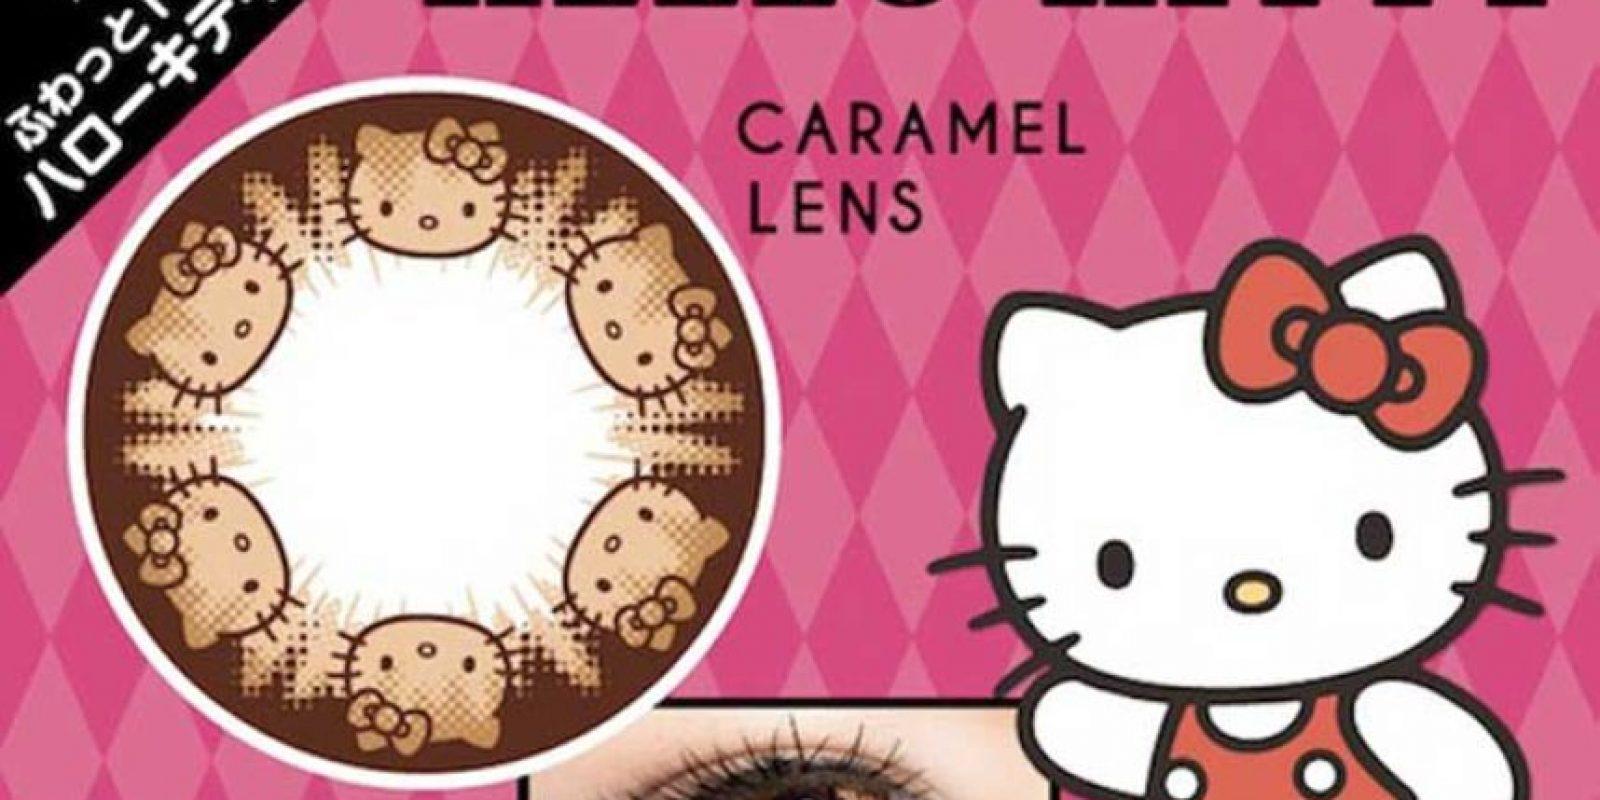 Lentes de contacto color caramelo de Hello Kity Foto:Upsocl